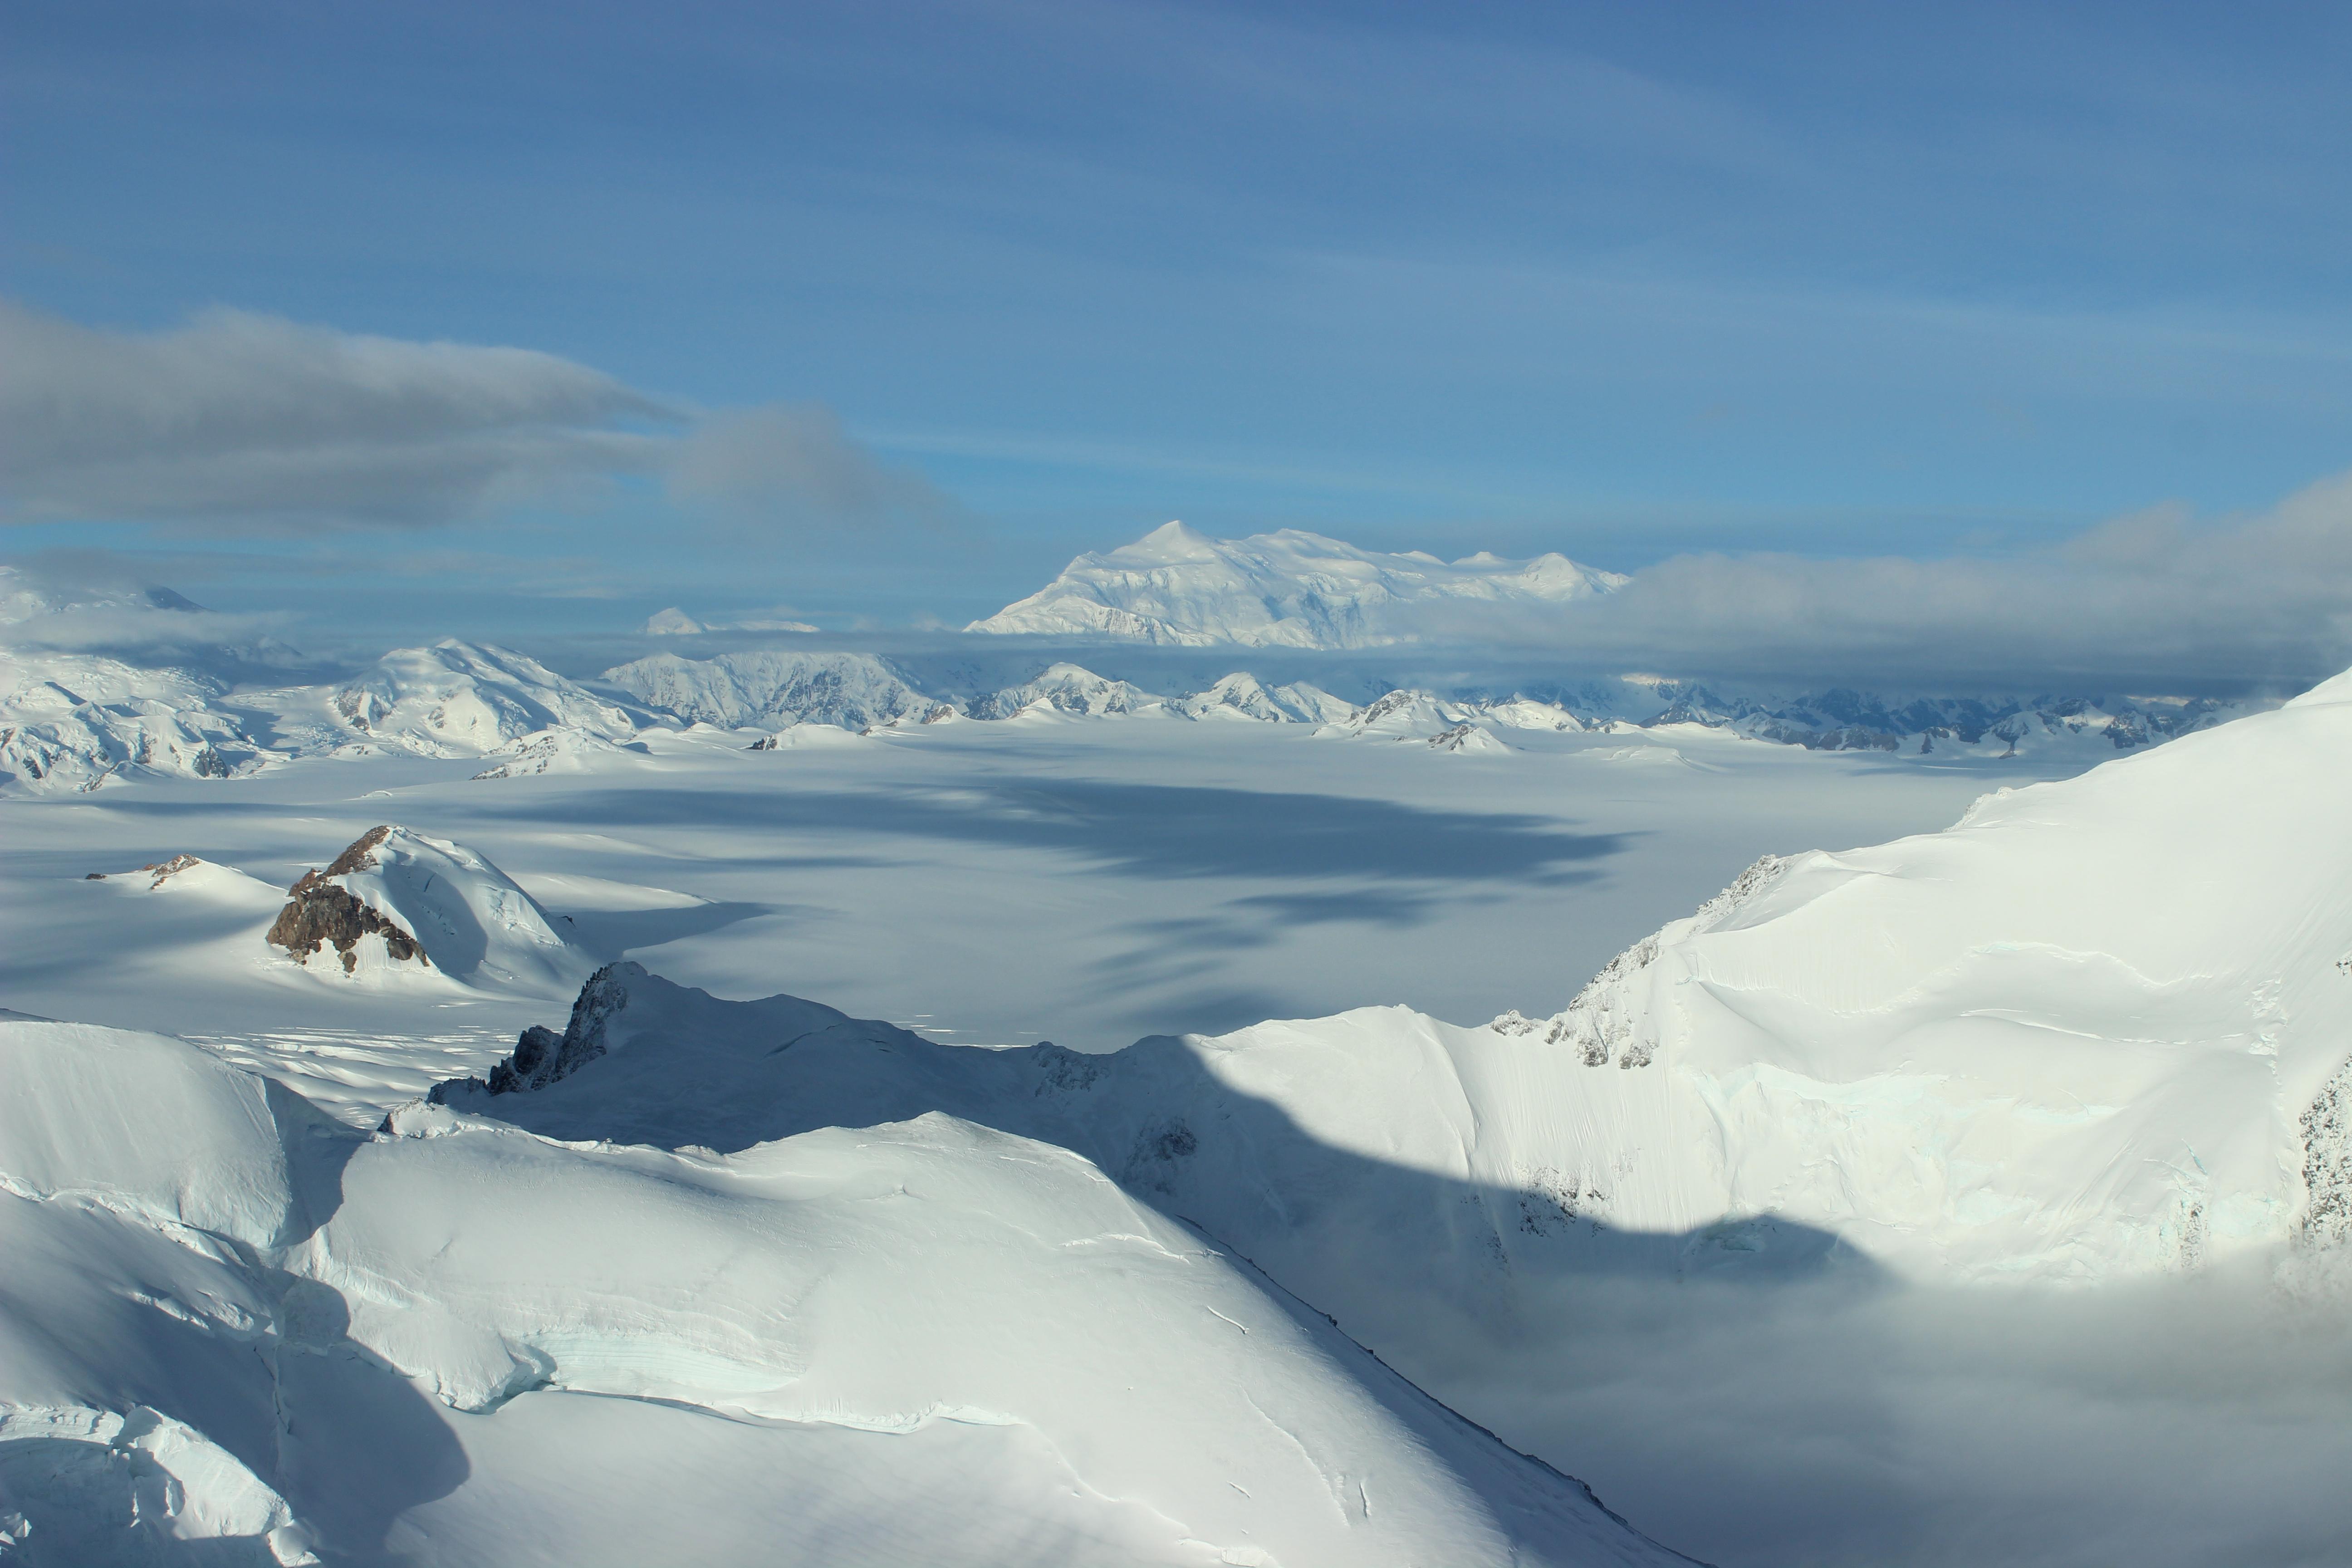 Vol au dessus d'un glacier